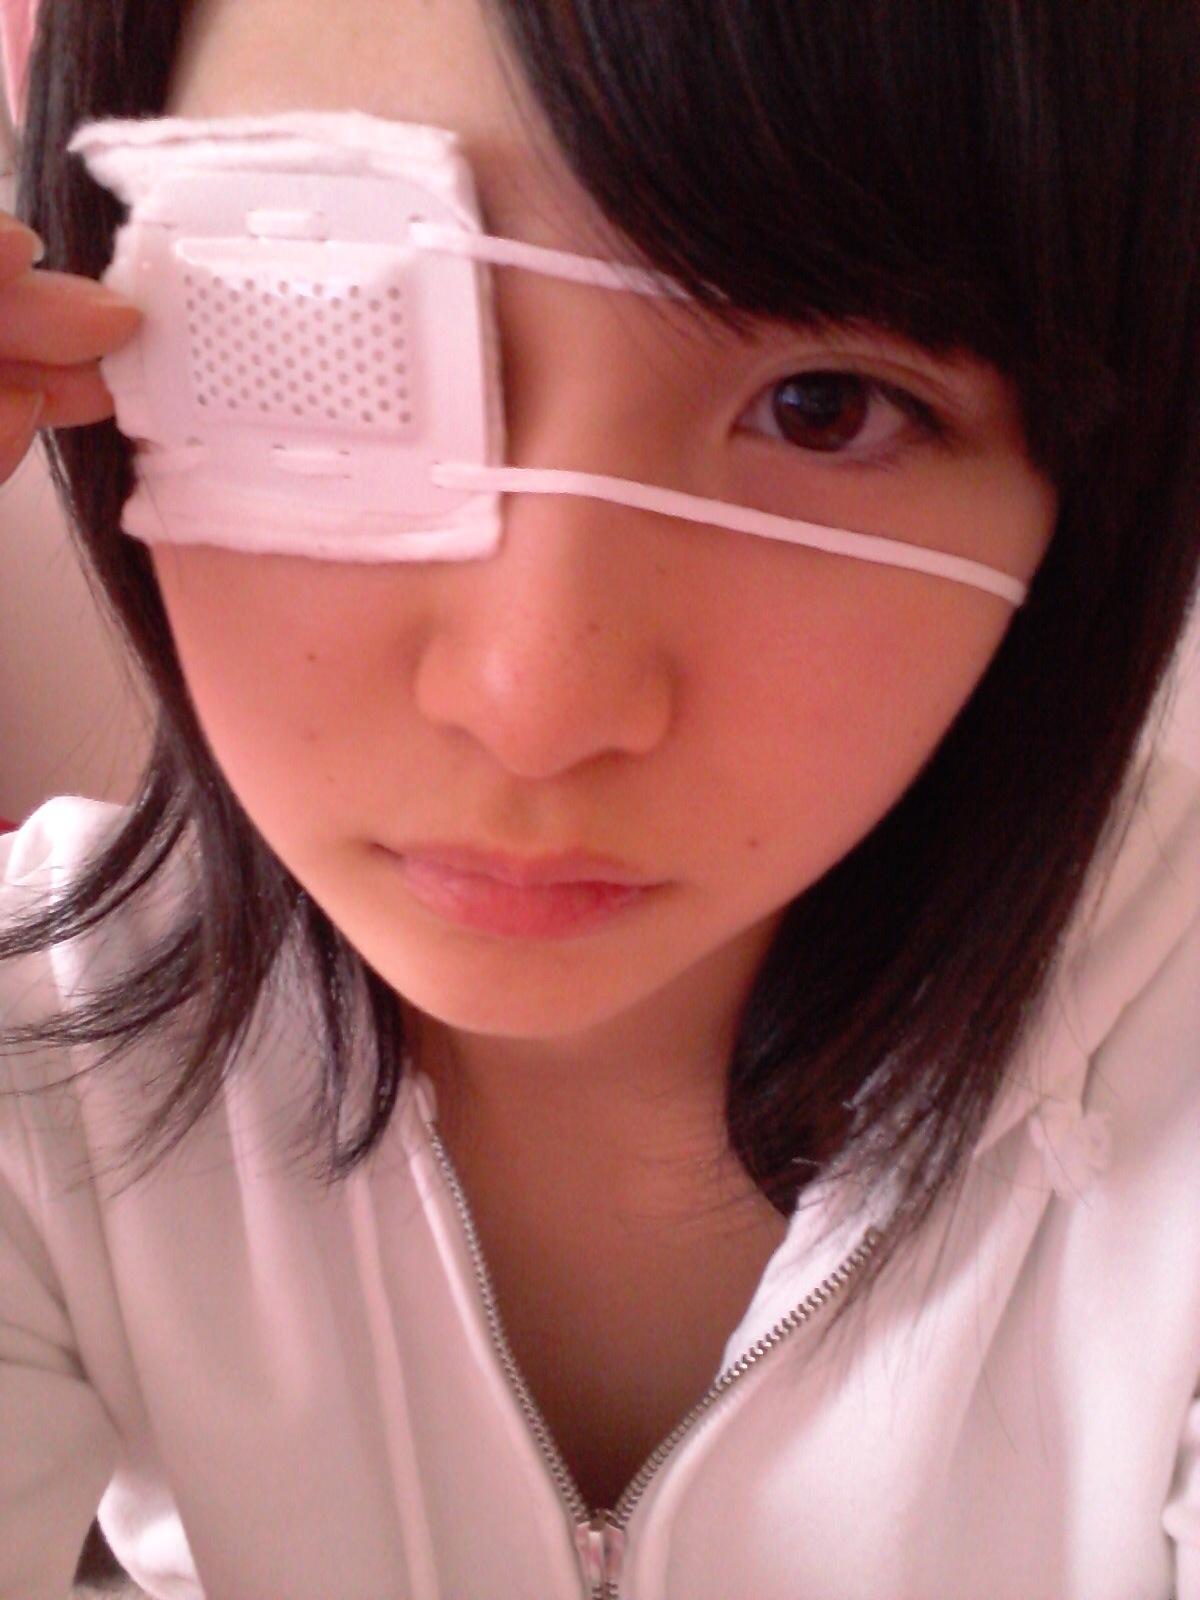 【AKB48】AKBはもう最終兵器の高橋朱里を世間に出すべき